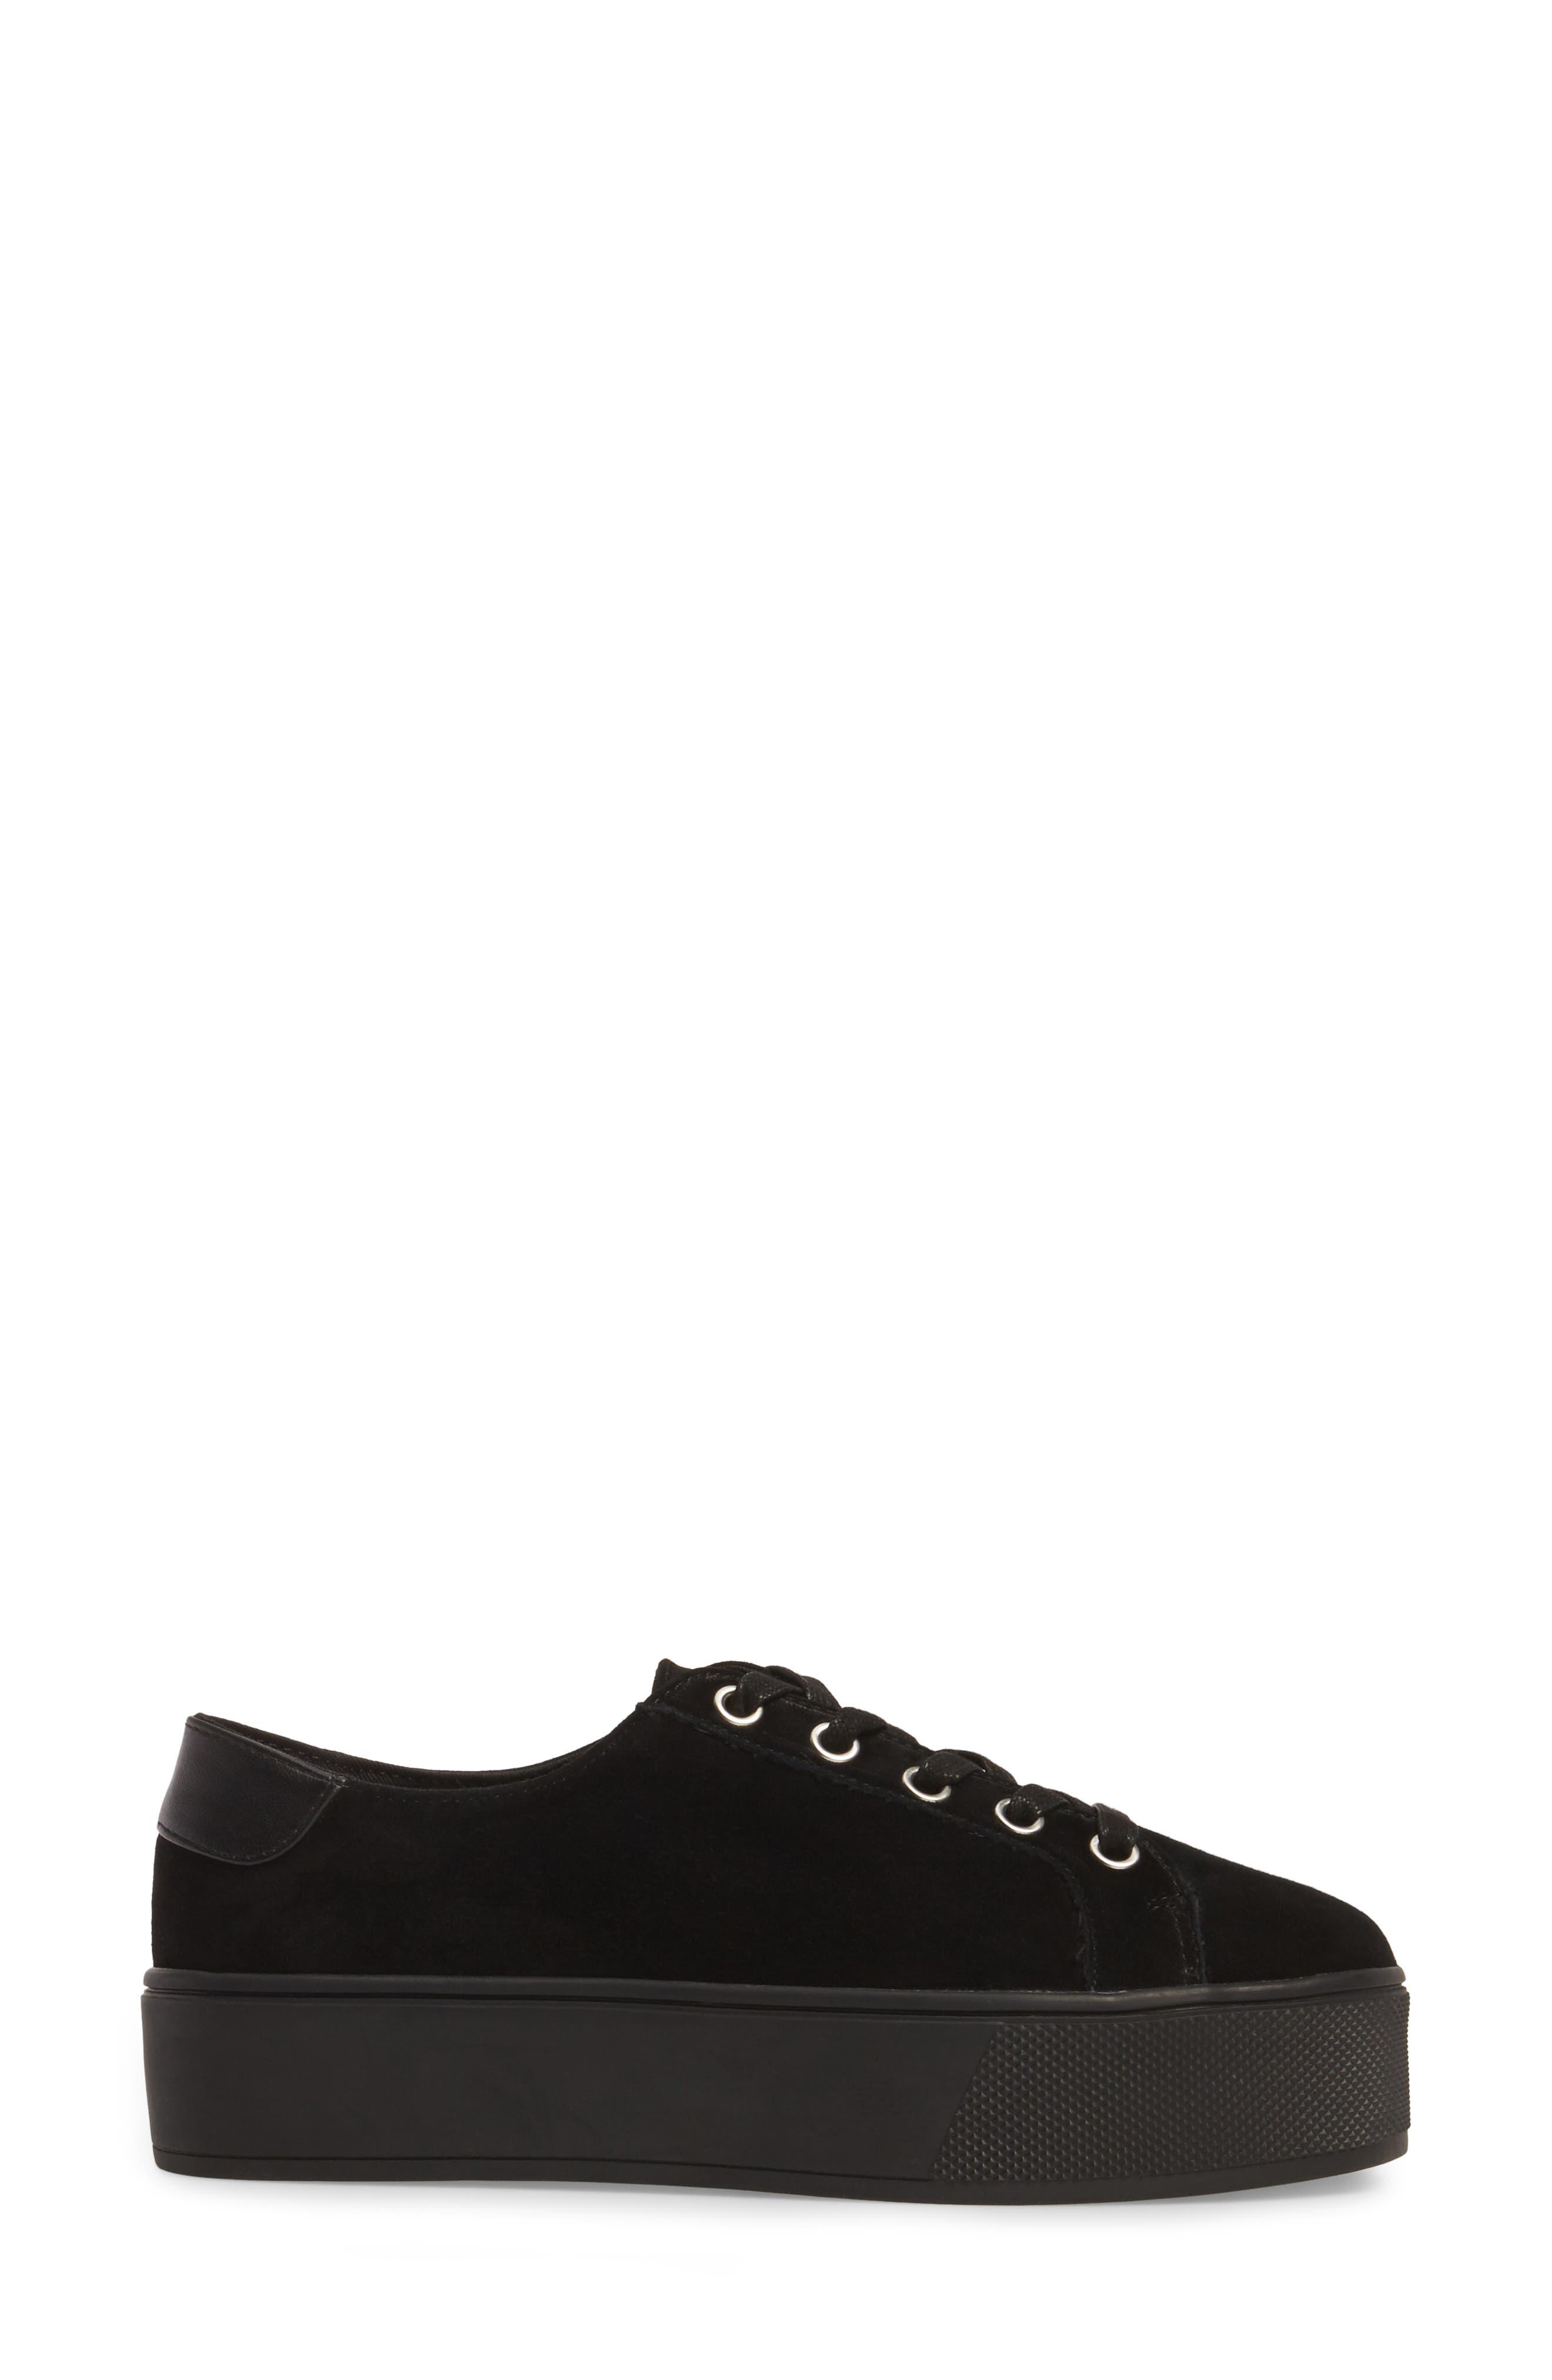 Felecia Platform Sneaker,                             Alternate thumbnail 3, color,                             Black Suede